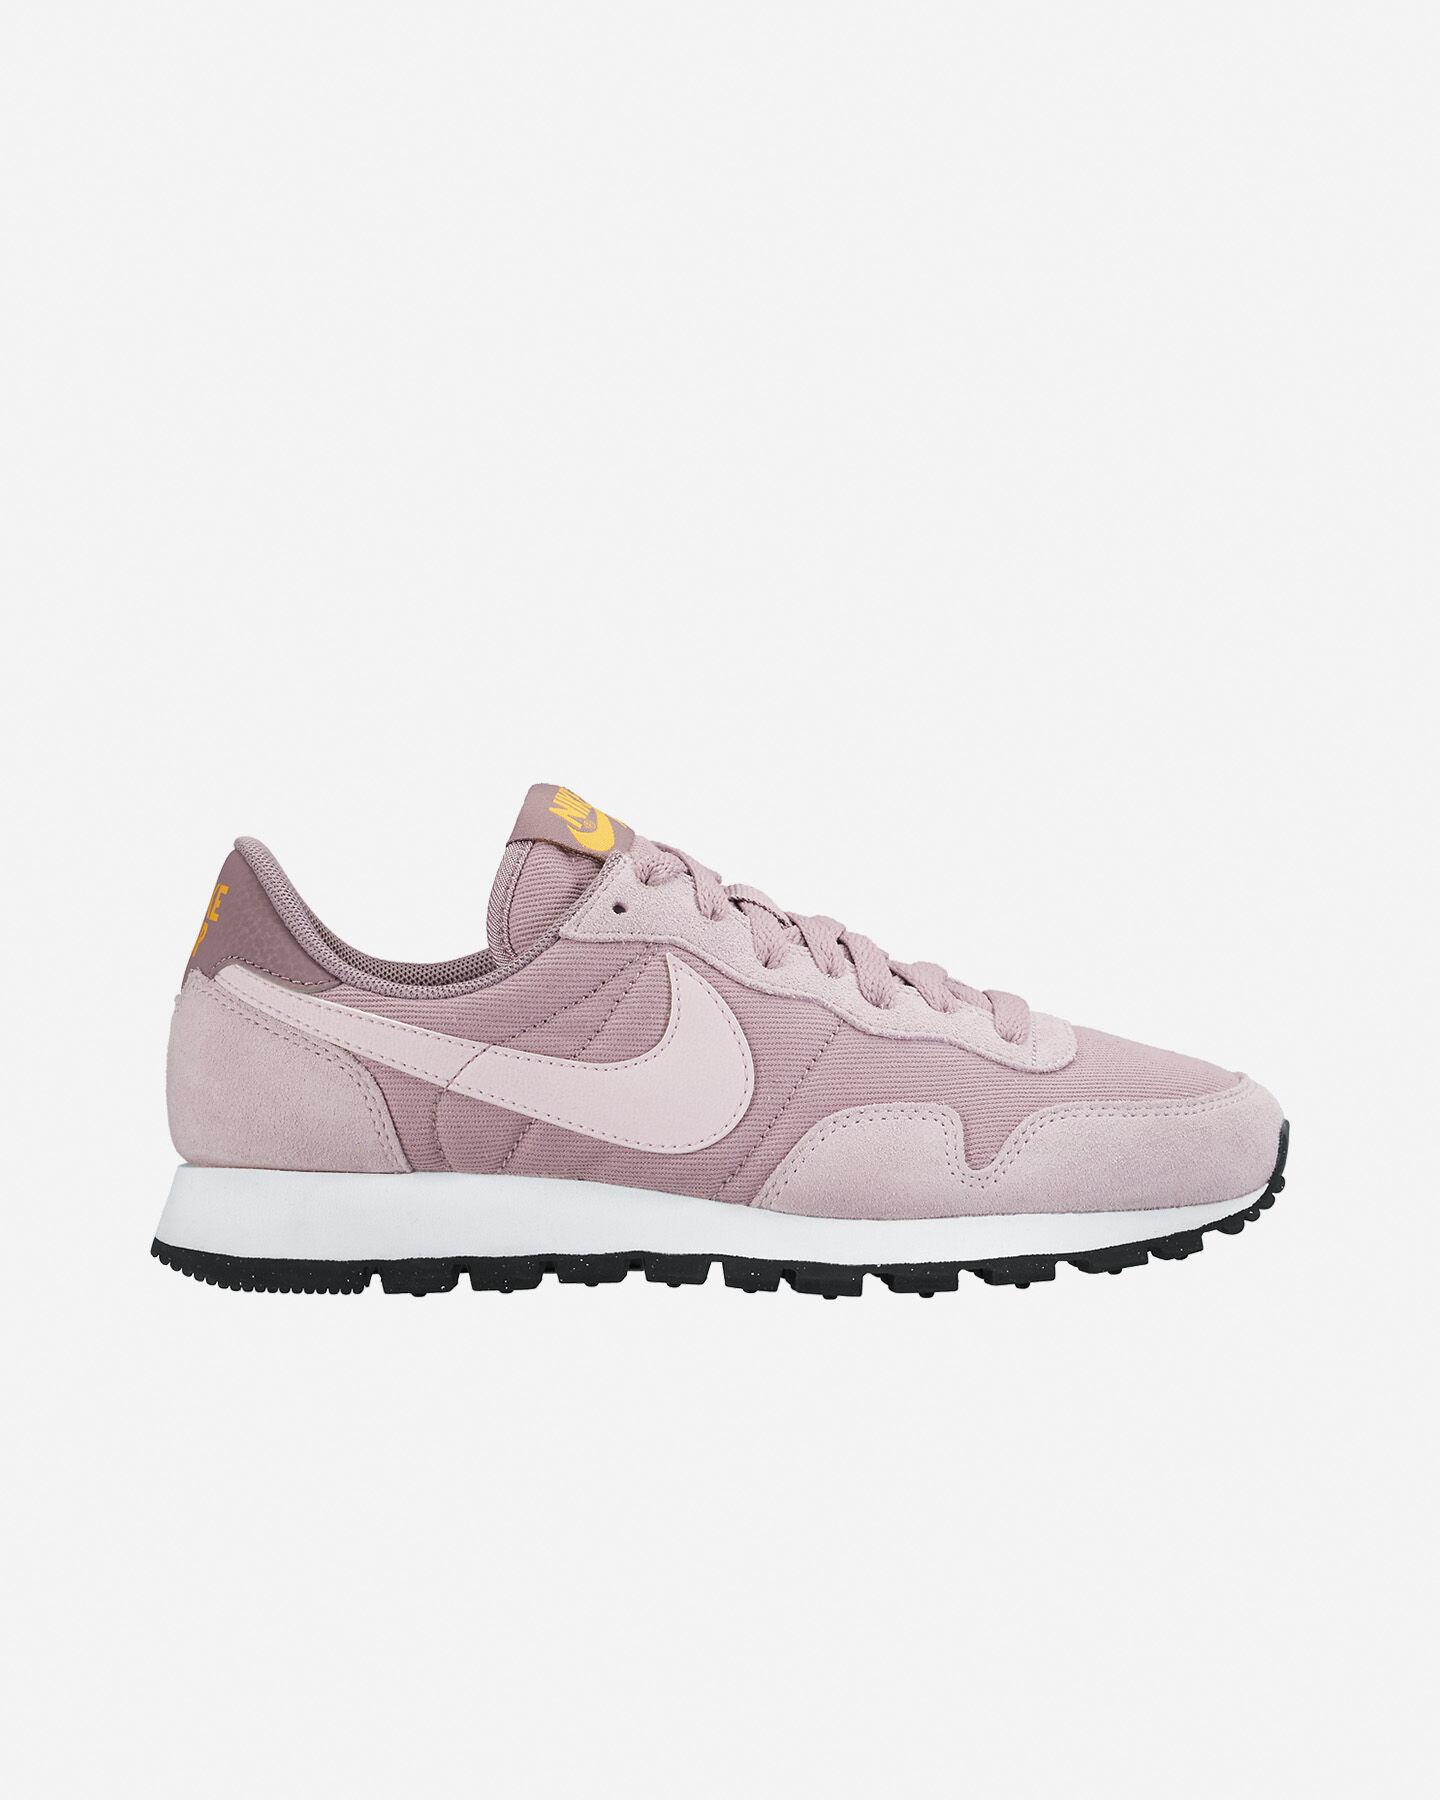 Nike Scarpe Nike Cisalfa Scarpe Donna Sport w4rzq4HE